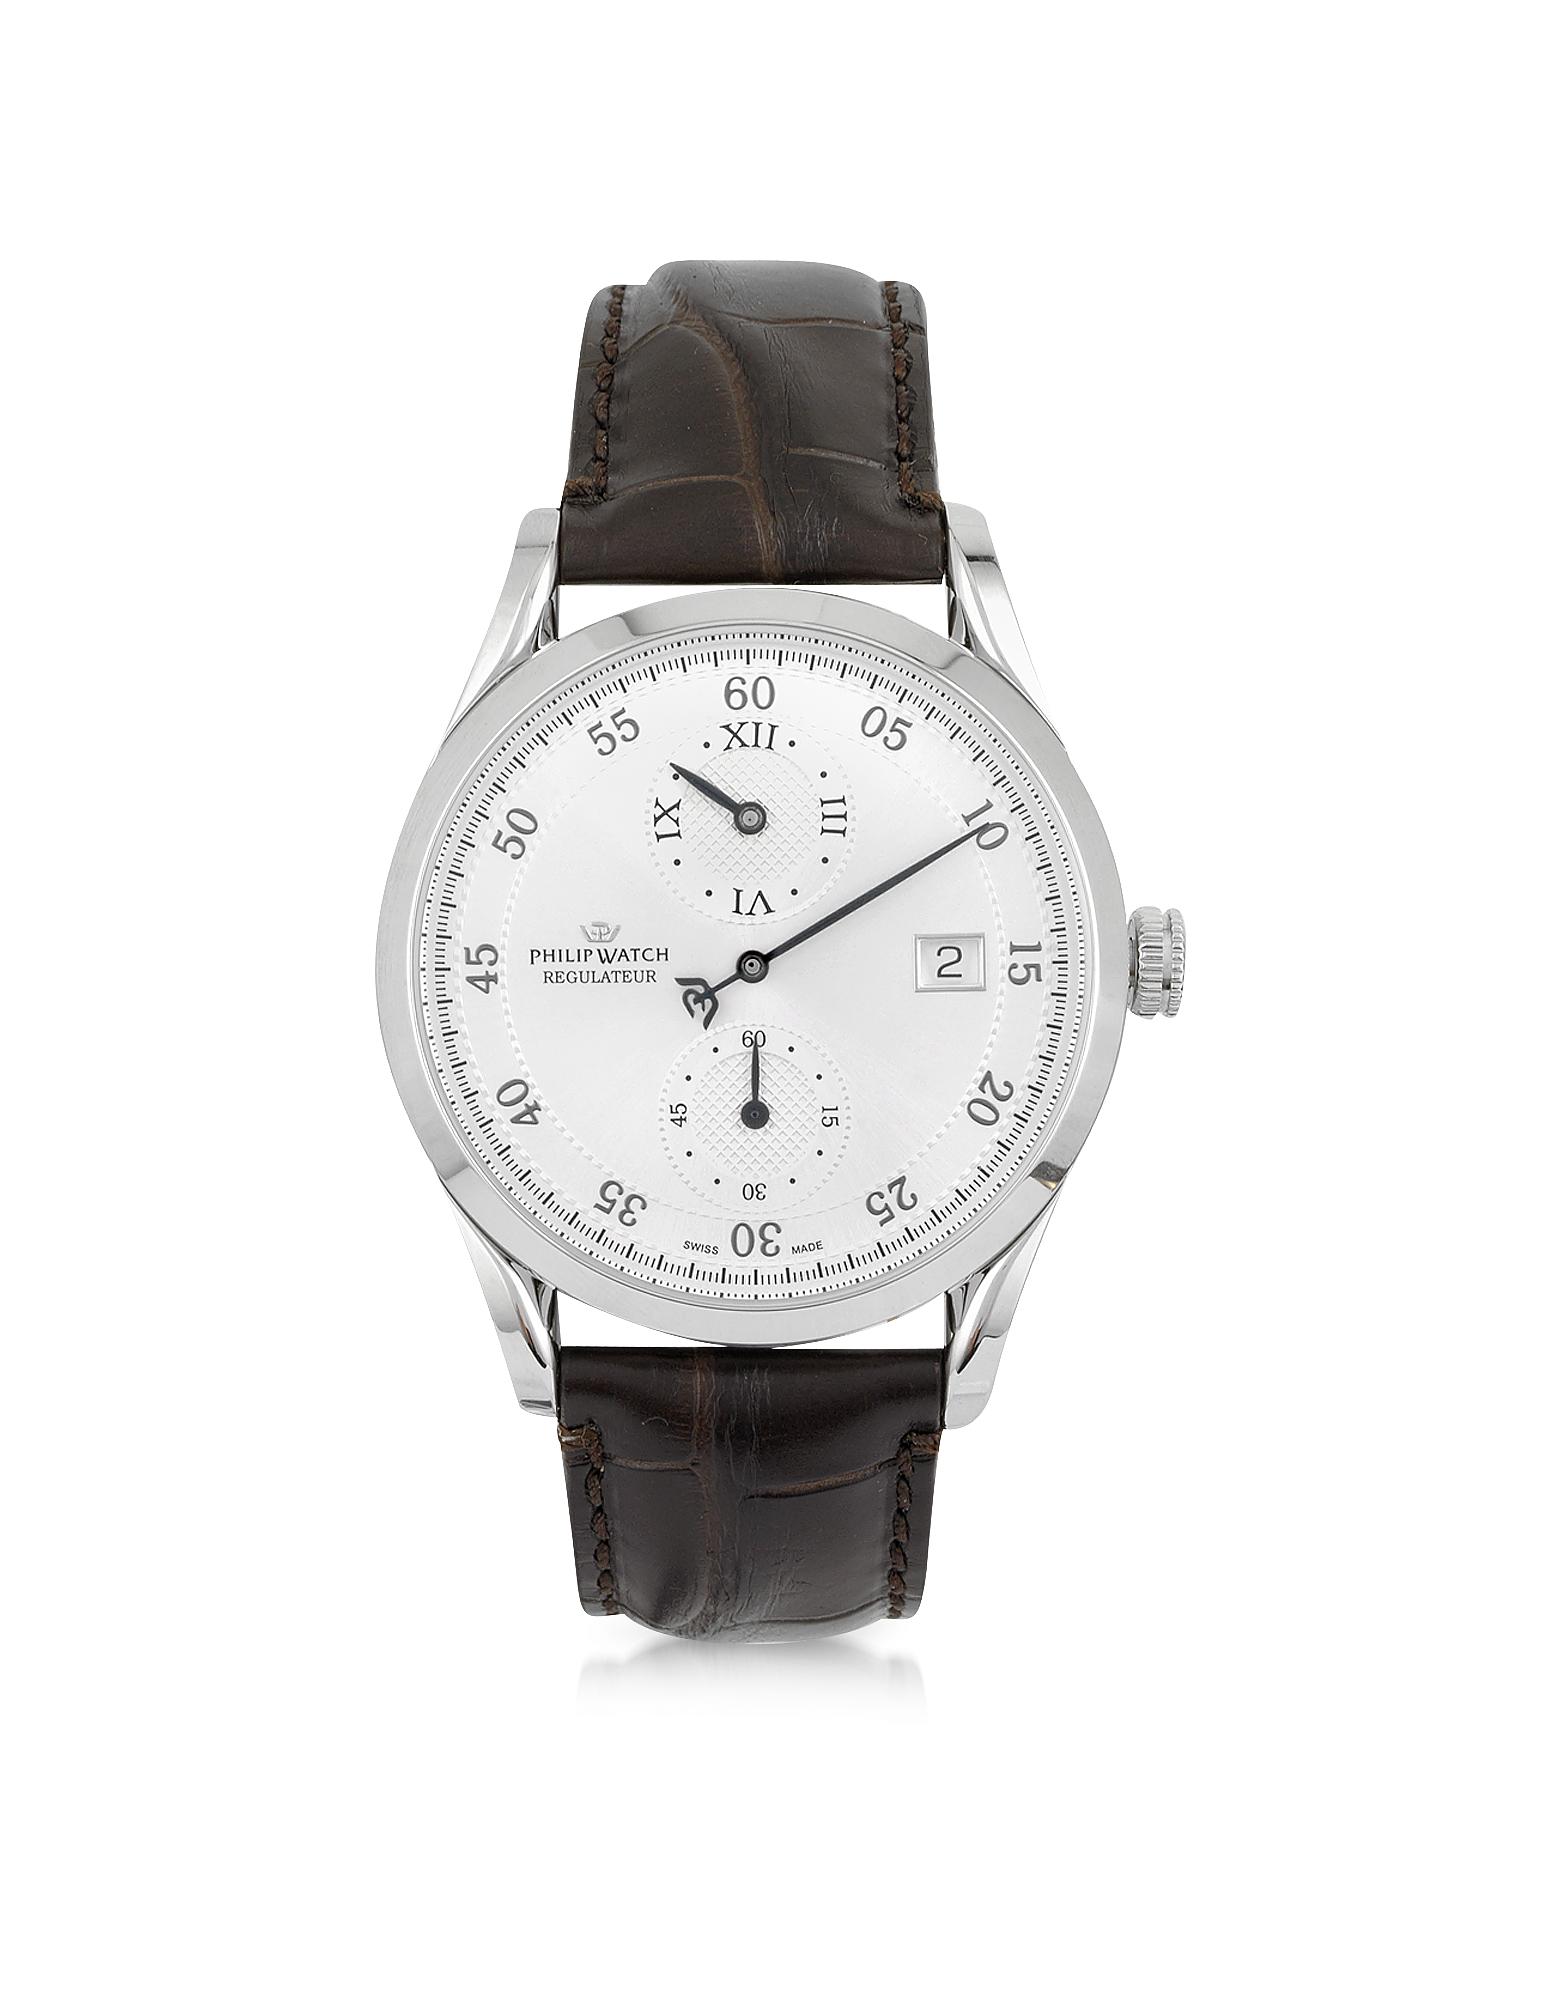 Philip Watch Sunray Heritage - Мужские Часы с Механизмом Автоматического Регулирования